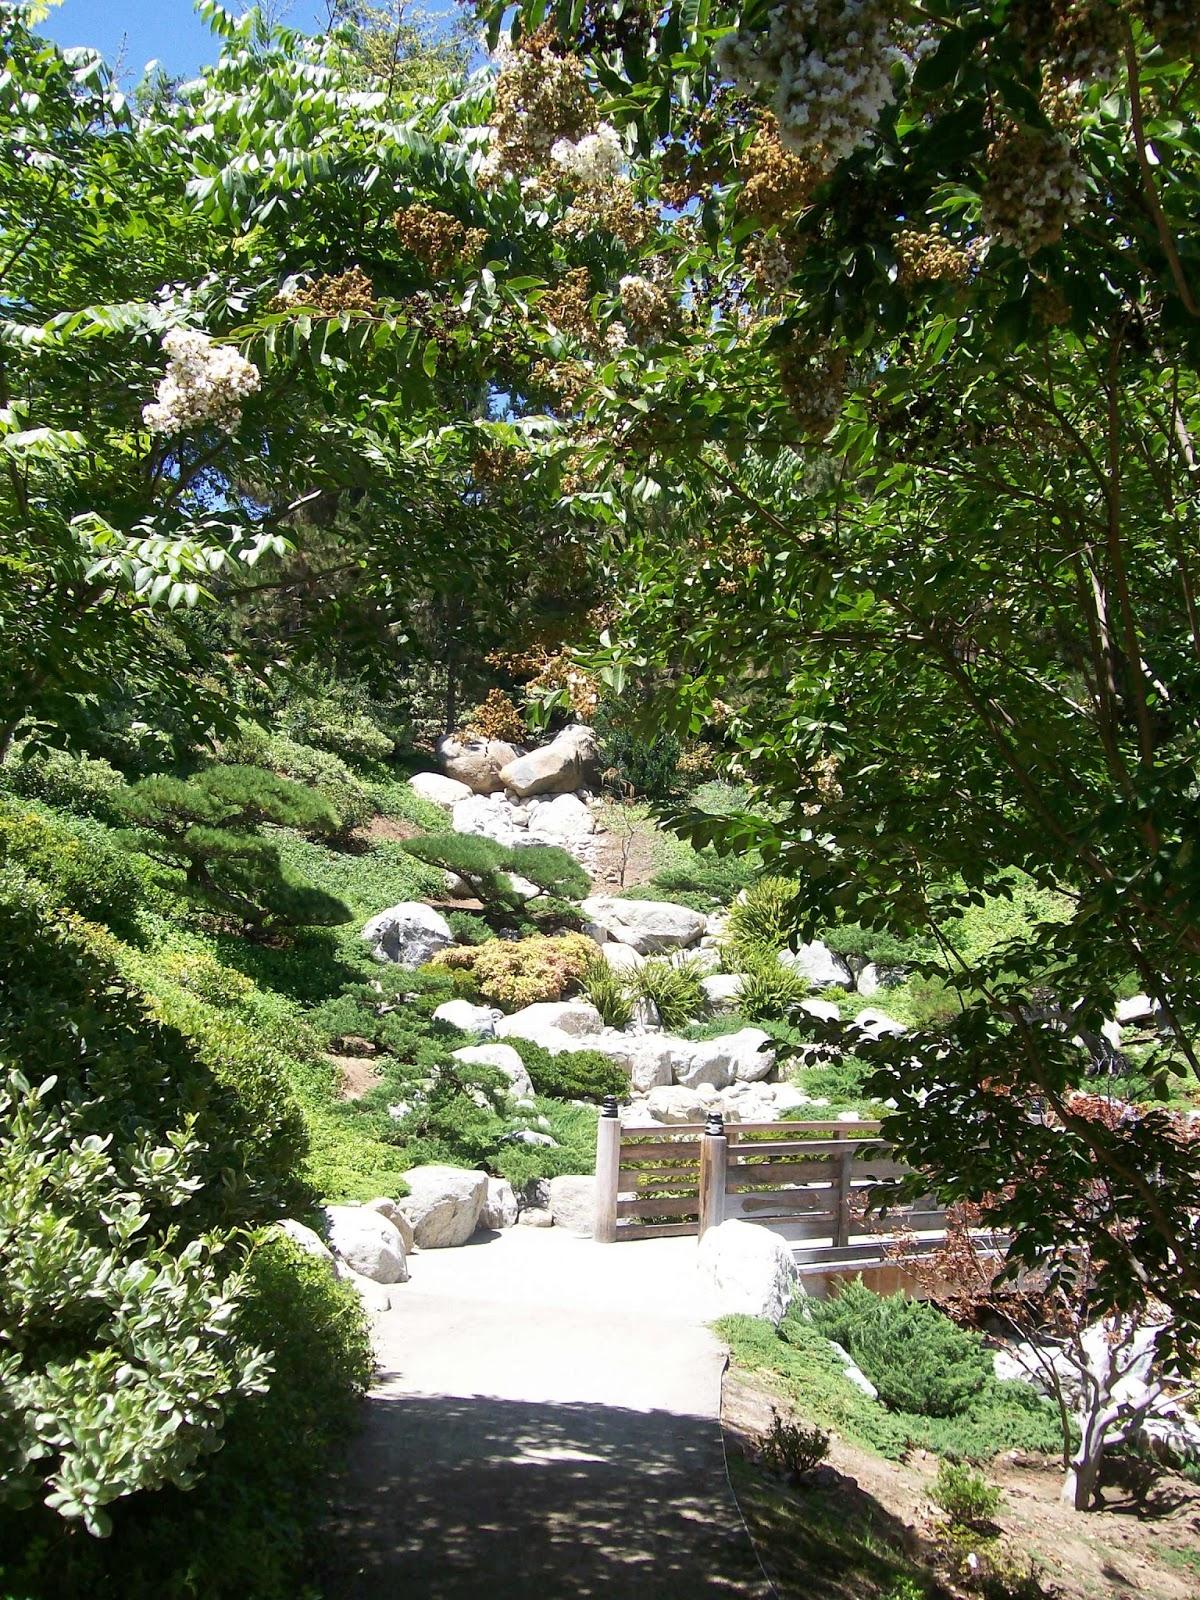 Intuitive value san diego vacation balboa park for Japanese friendship garden